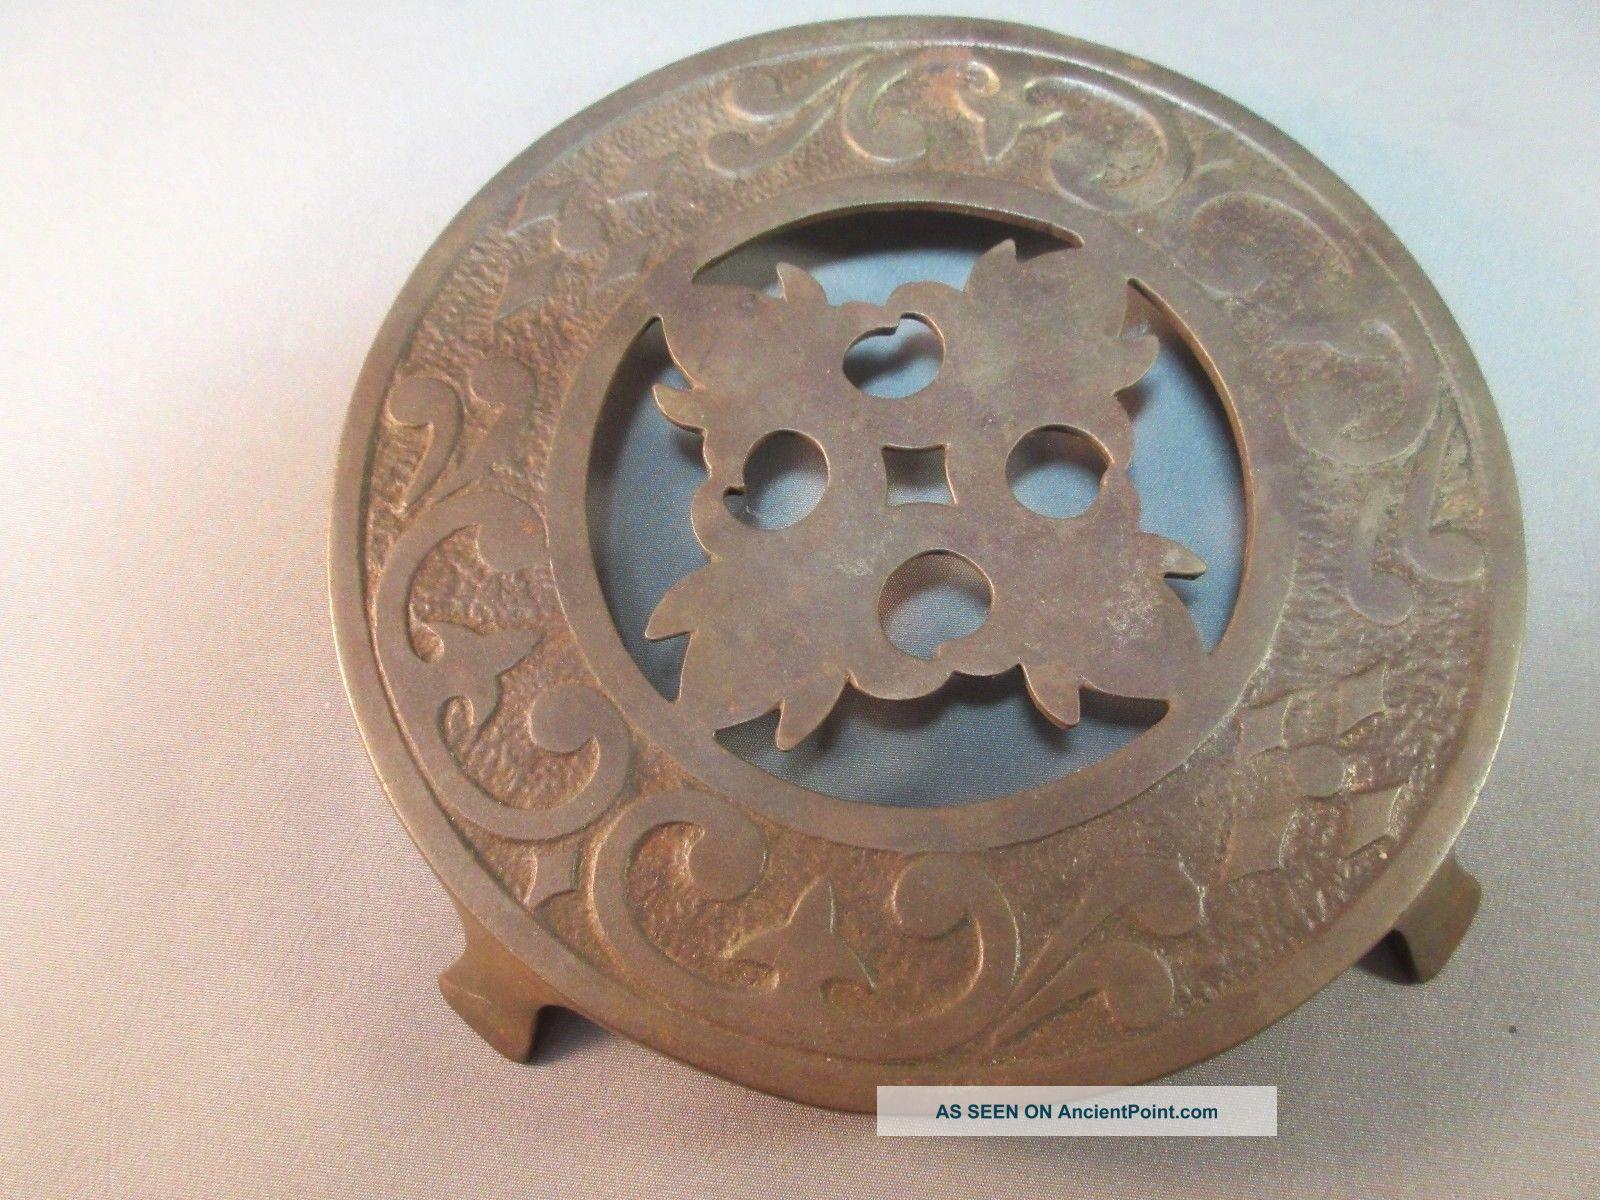 Antique Metal Decorative Round Cut - Out Trivet Sun Dry Manufacturing Company Trivets photo